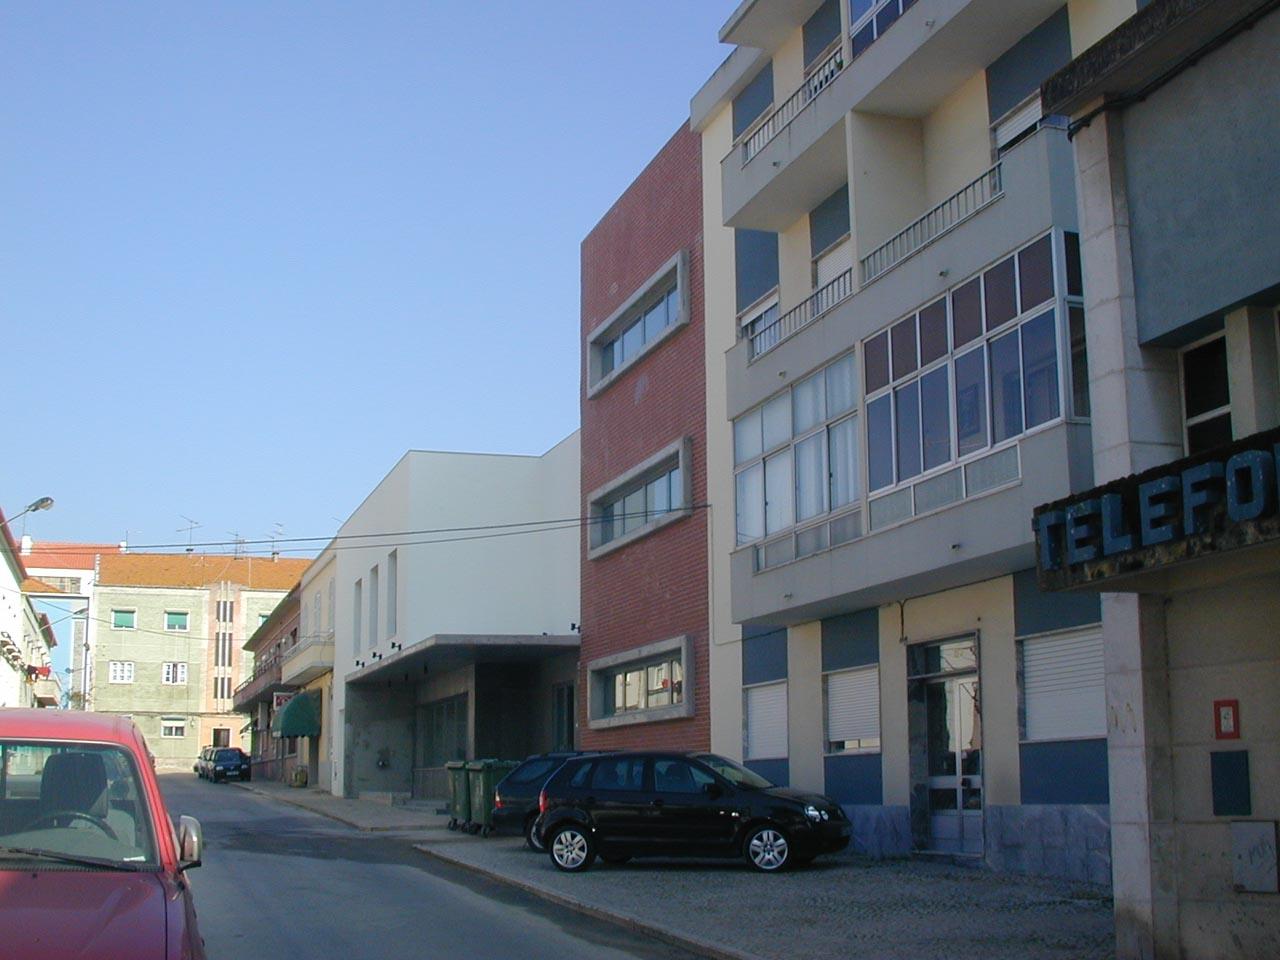 https://www.araujo-arquitectura.pt/wp-content/uploads/2020/12/DSCN0029.jpg